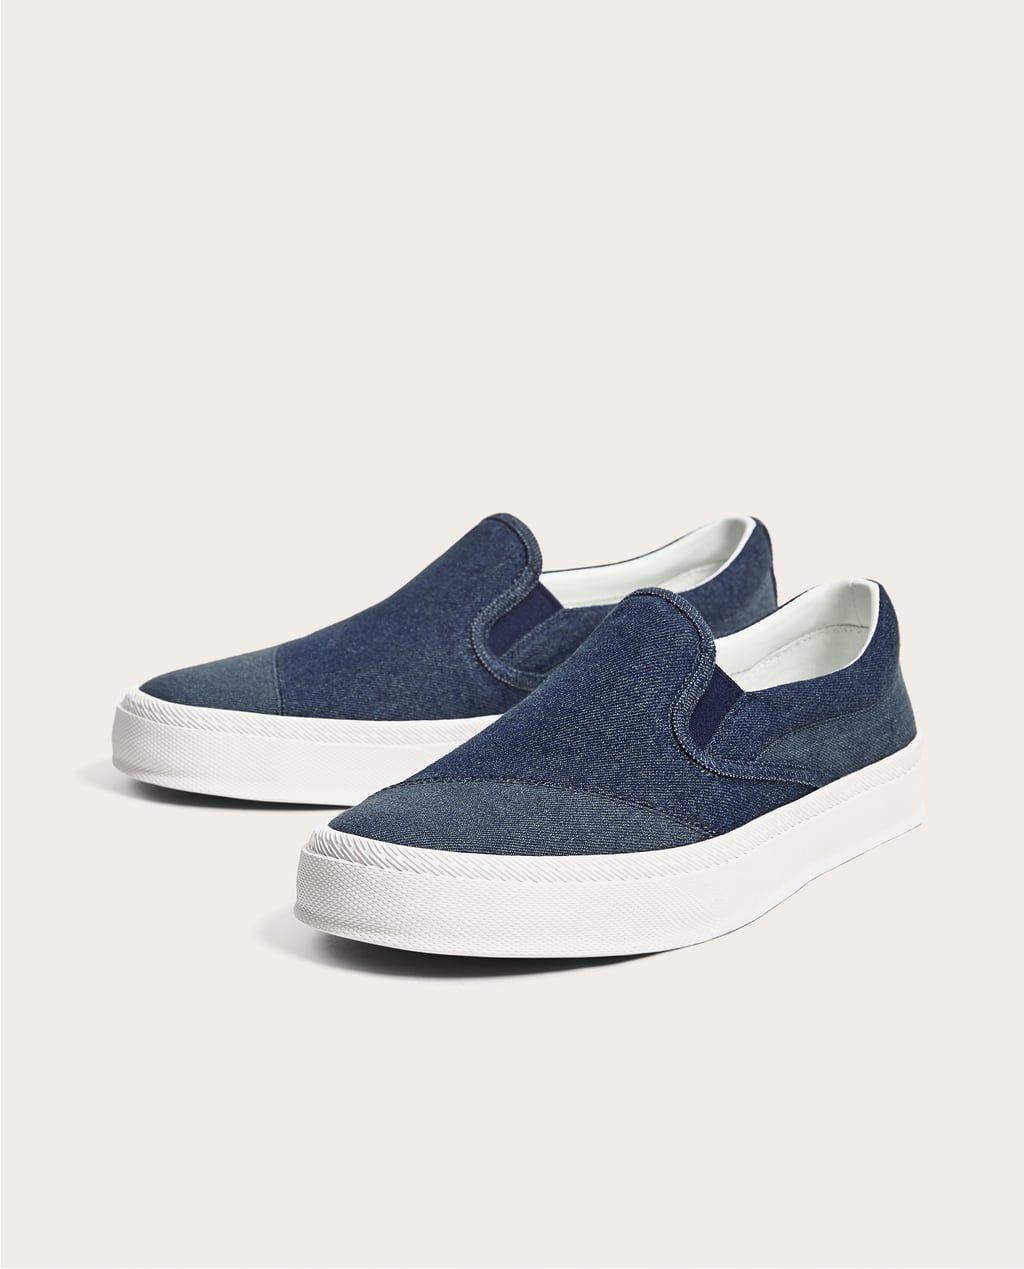 Deportivo Denim Ver Todo Zapatos Hombre Rebajas Zara Colombia Sneaker Kinder Schuhe Schuhe